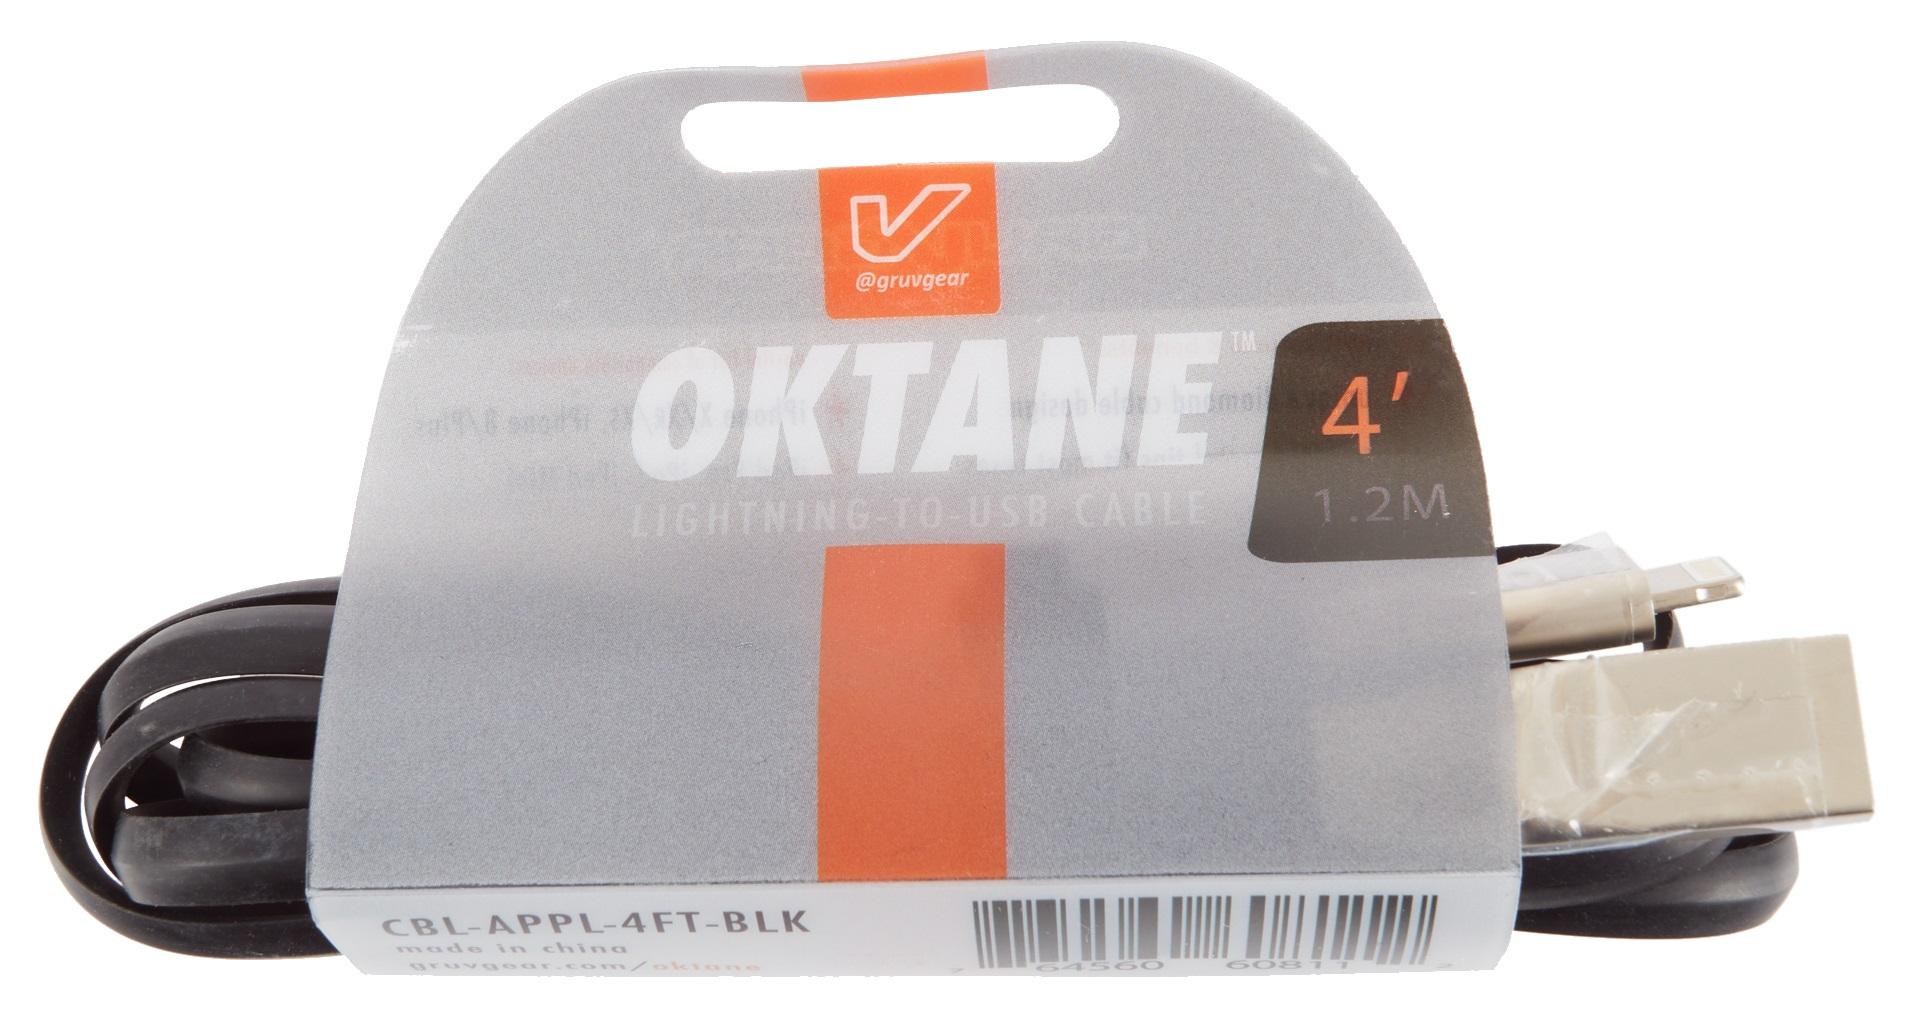 Gruvgear Oktane Charging Cable Lightning 6'